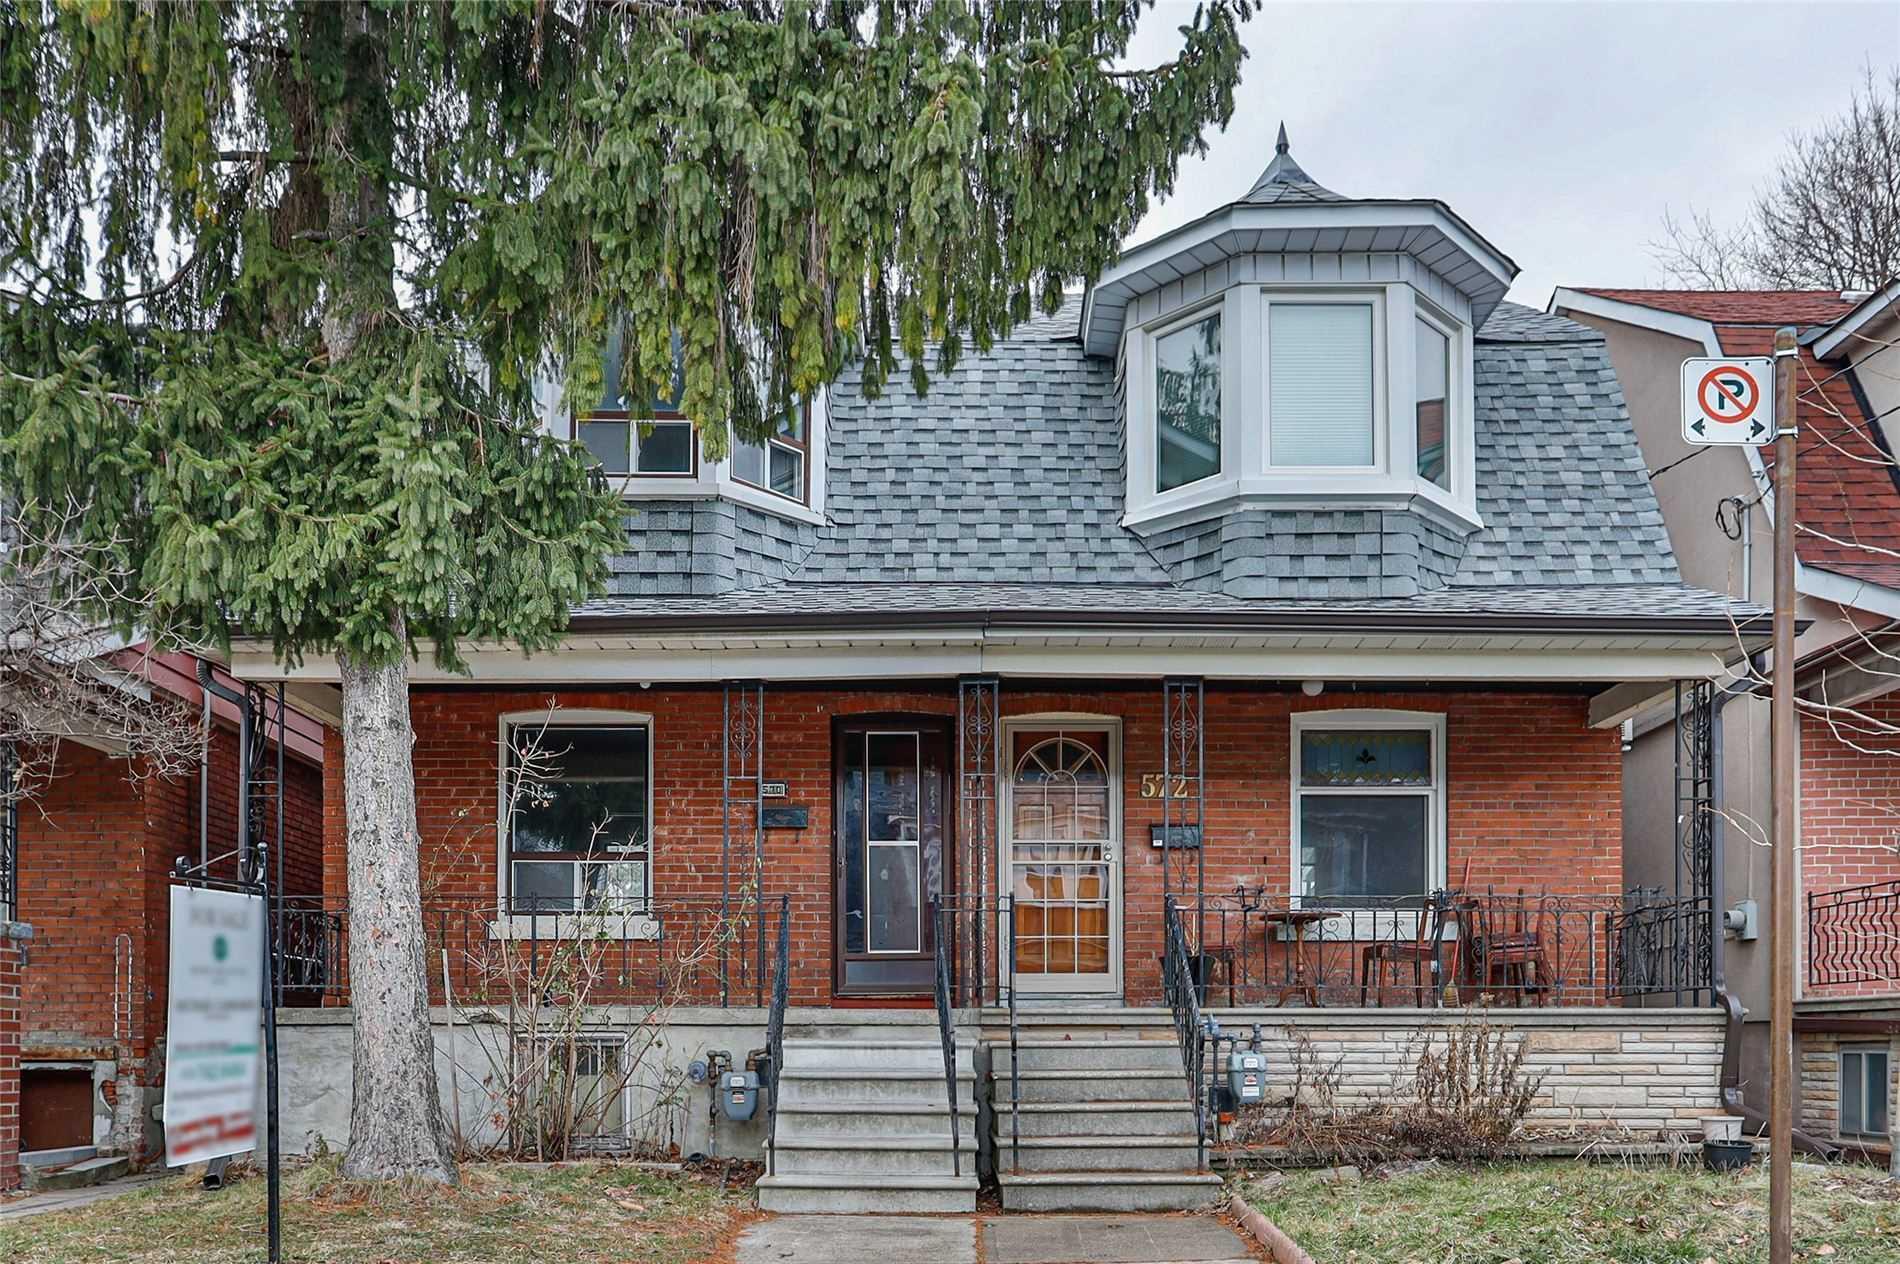 570 Clinton St, Toronto, Ontario M6G 2Z6, 3 Bedrooms Bedrooms, 8 Rooms Rooms,2 BathroomsBathrooms,Semi-detached,For Sale,Clinton,C5088036